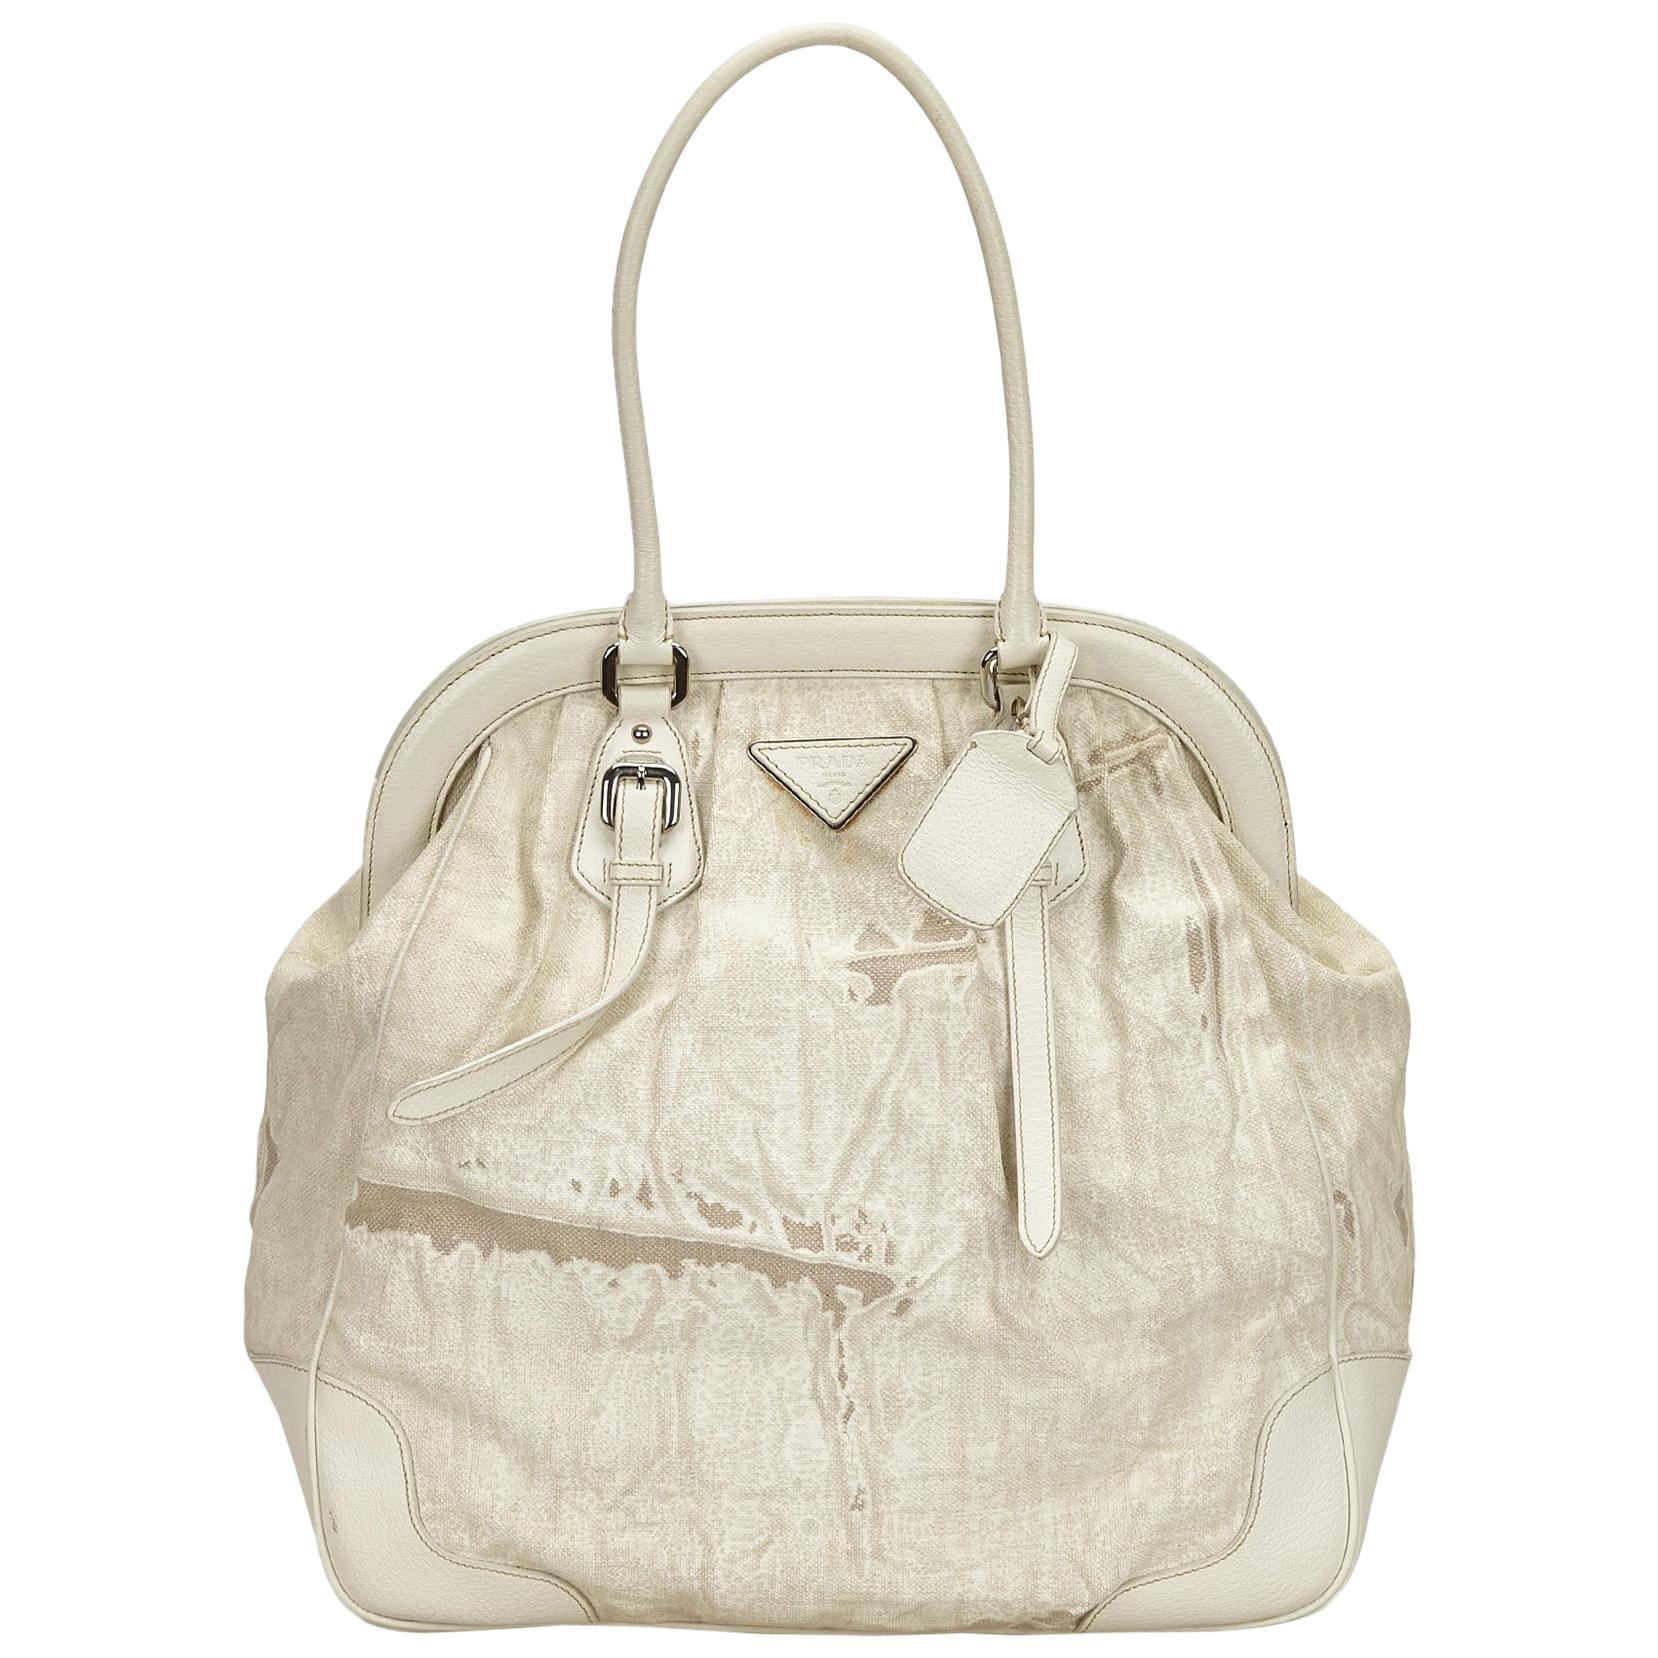 1a54b616229fa8 ... reduced vintage prada handbags and purses 752 for sale at 1stdibs ac156  a33a7